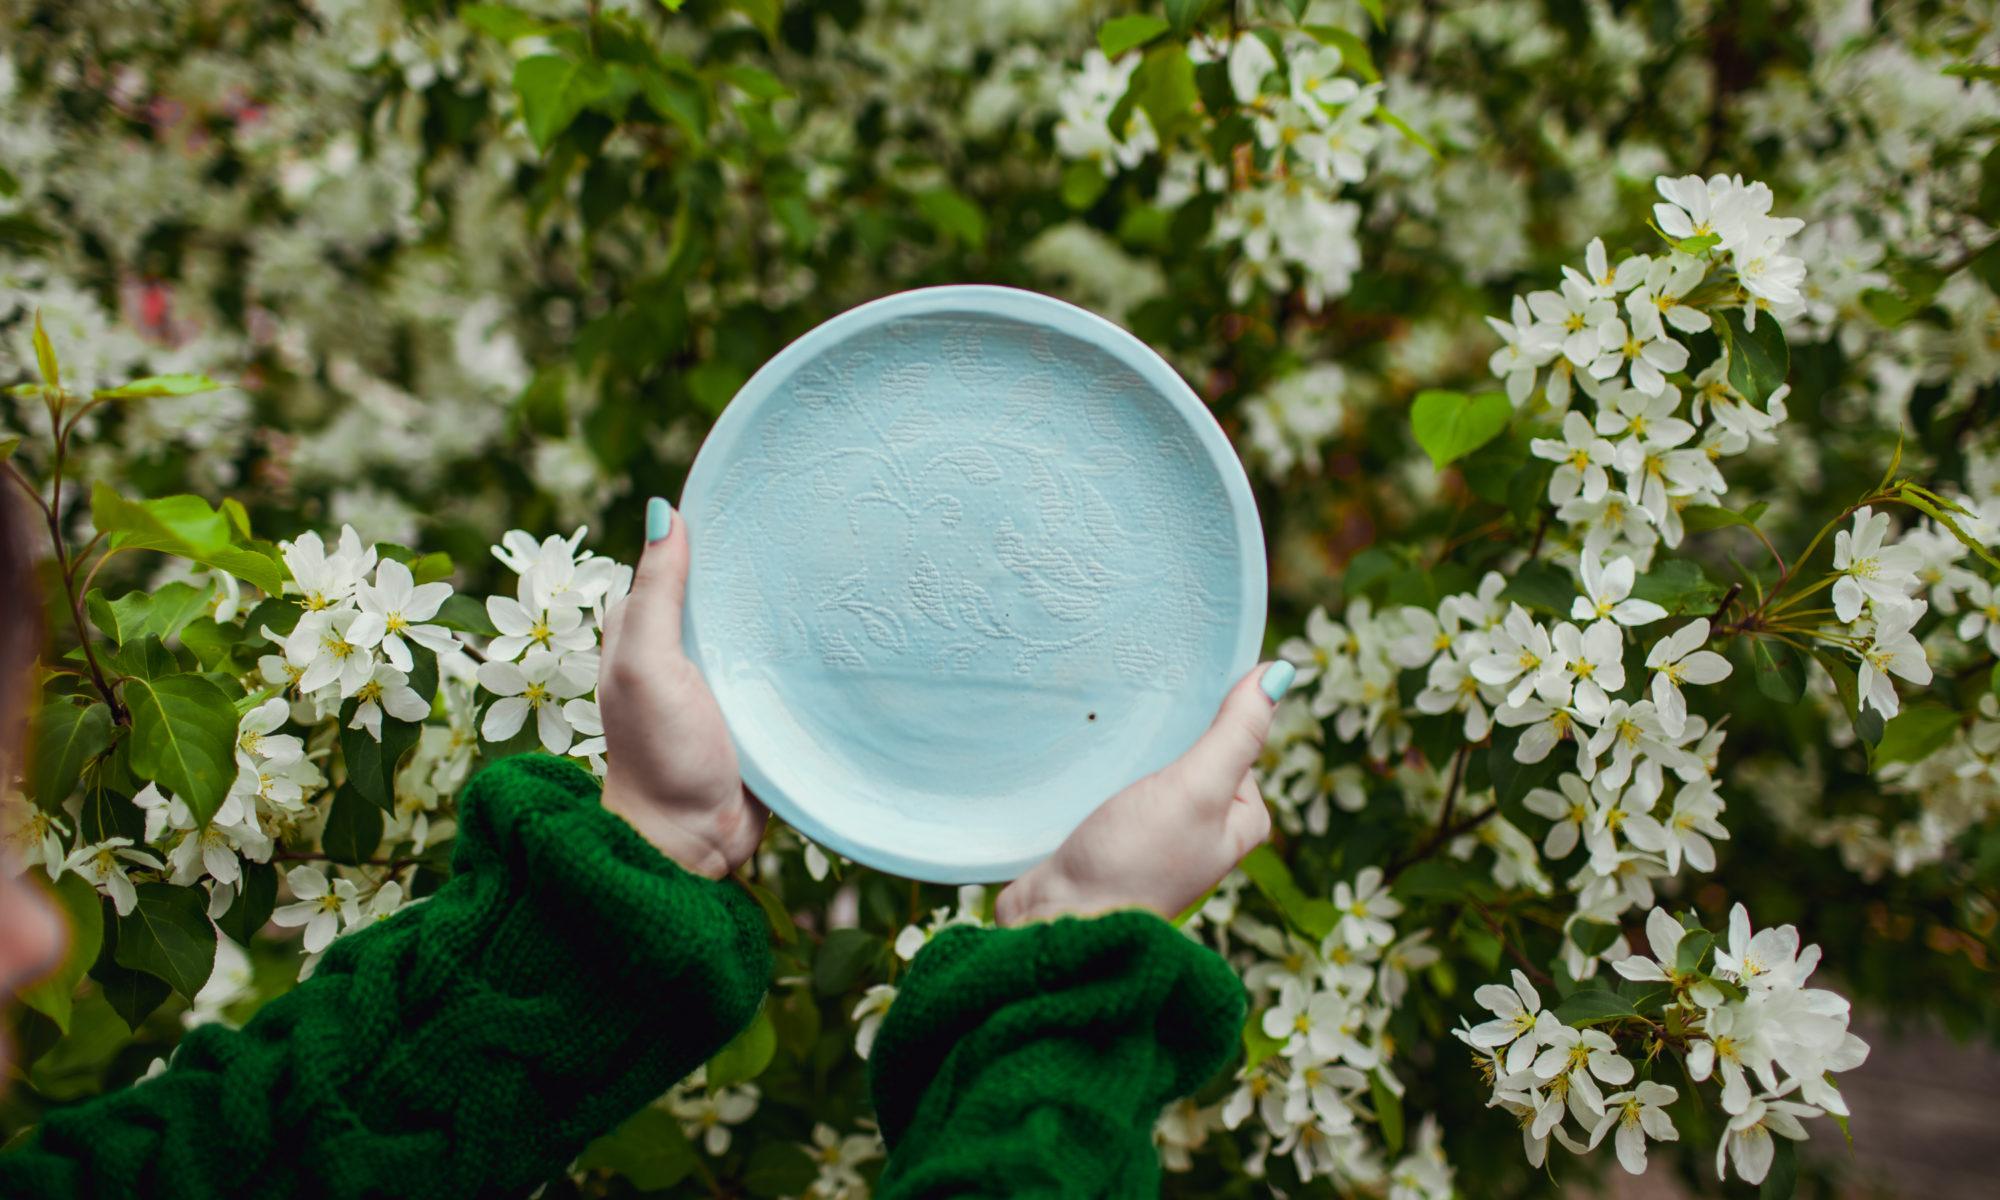 тарелка голубая средняя